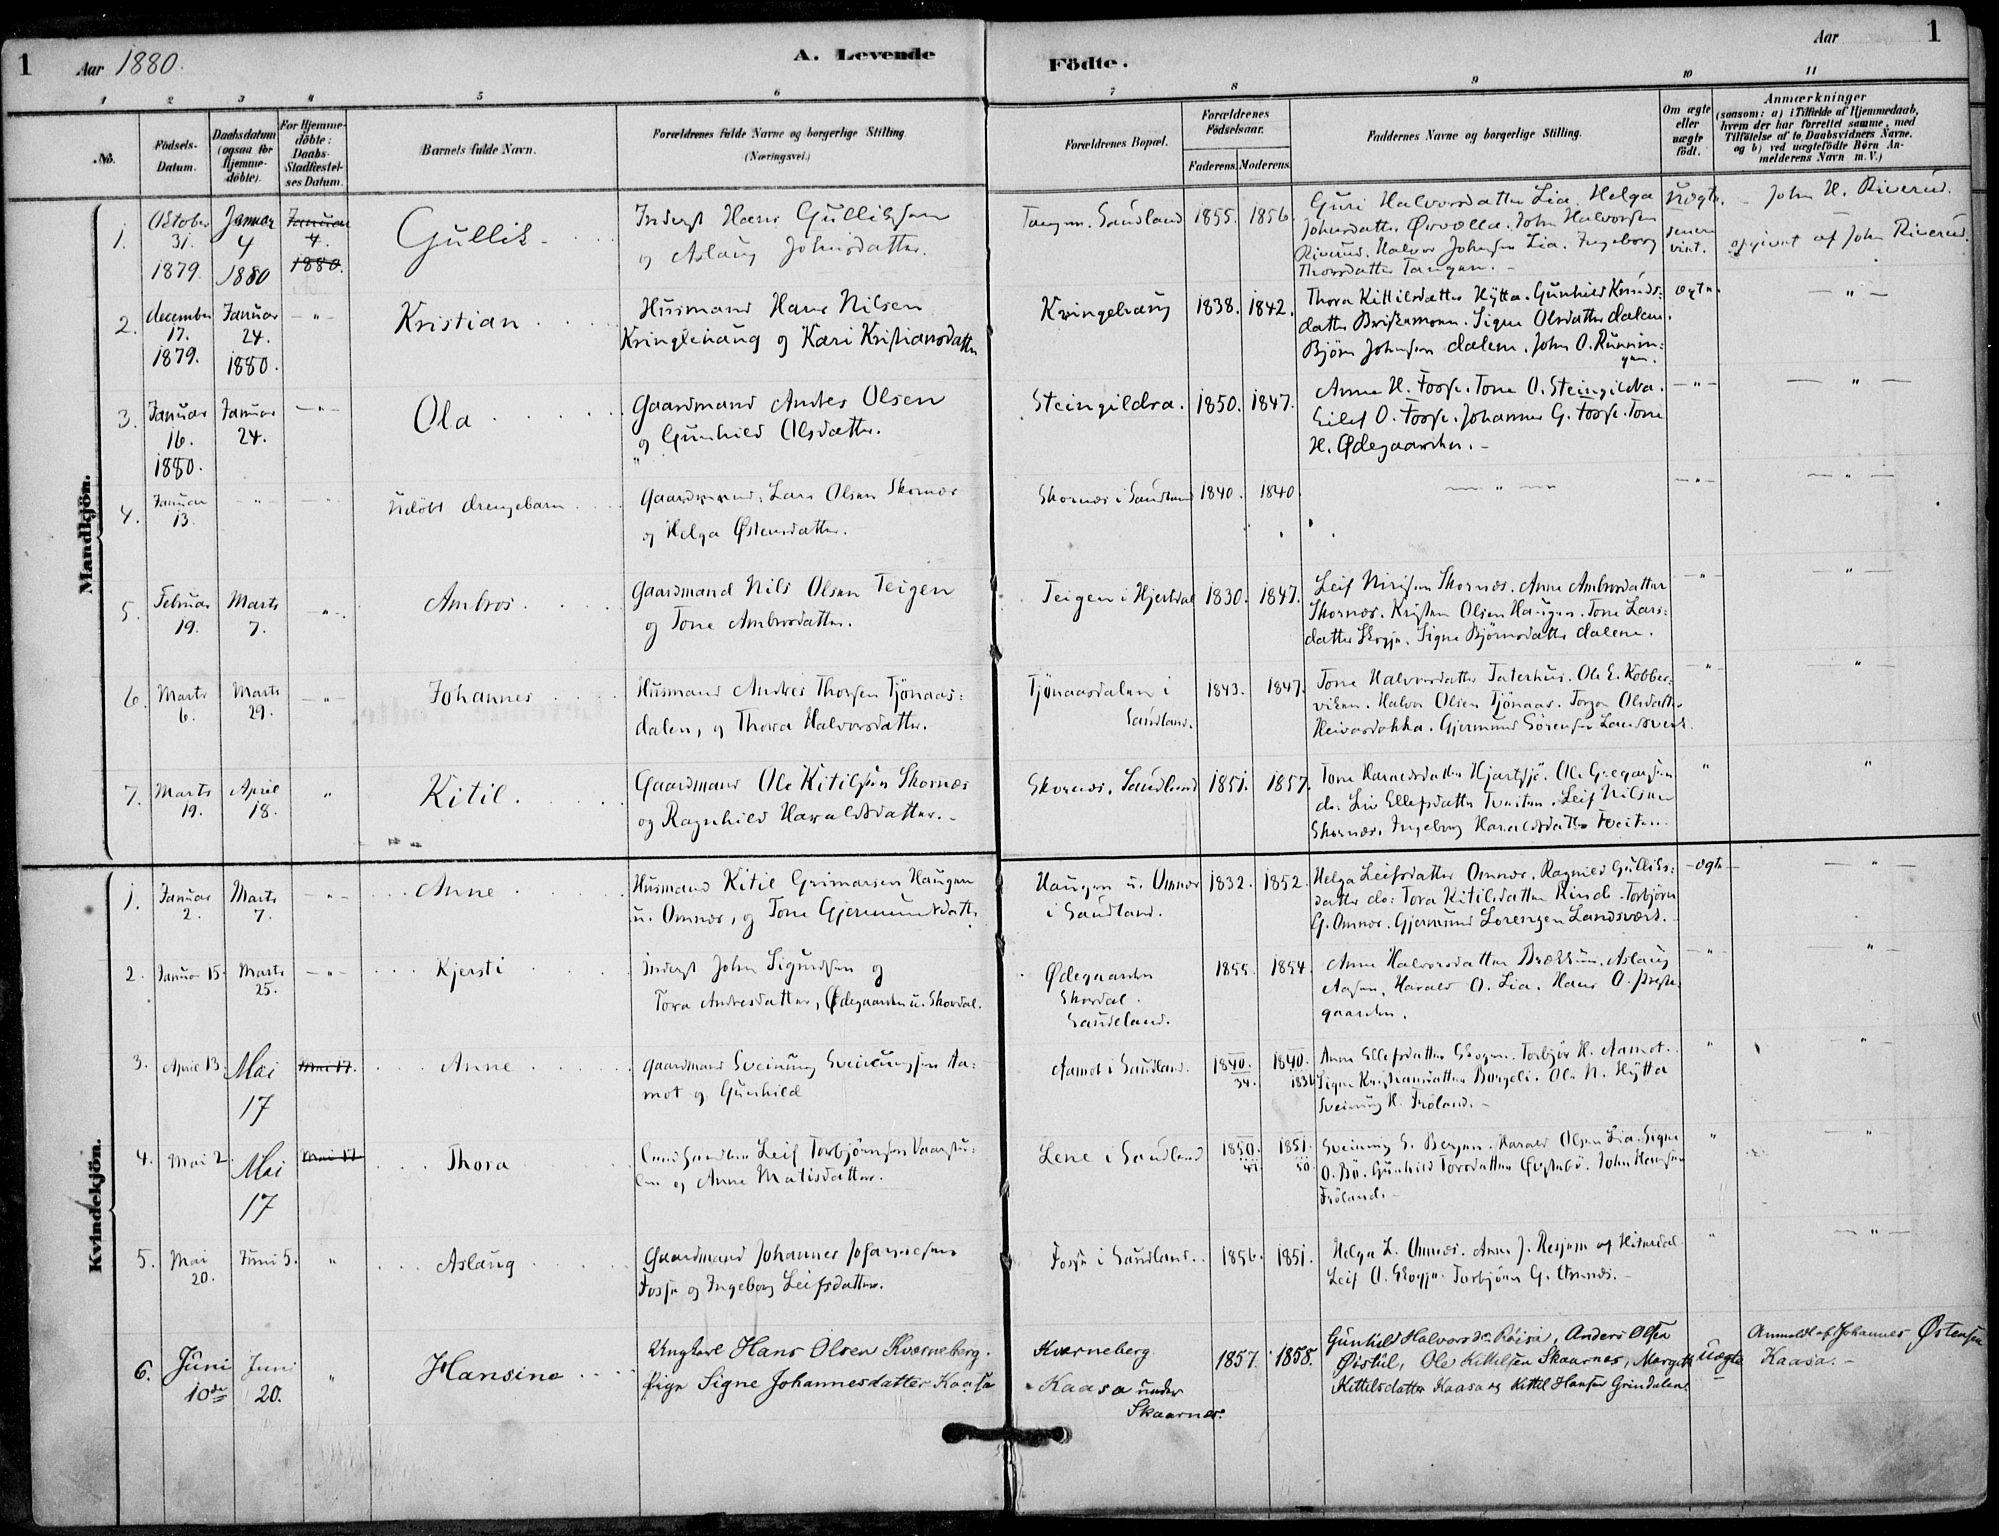 SAKO, Hjartdal kirkebøker, F/Fb/L0002: Ministerialbok nr. II 2, 1880-1932, s. 1